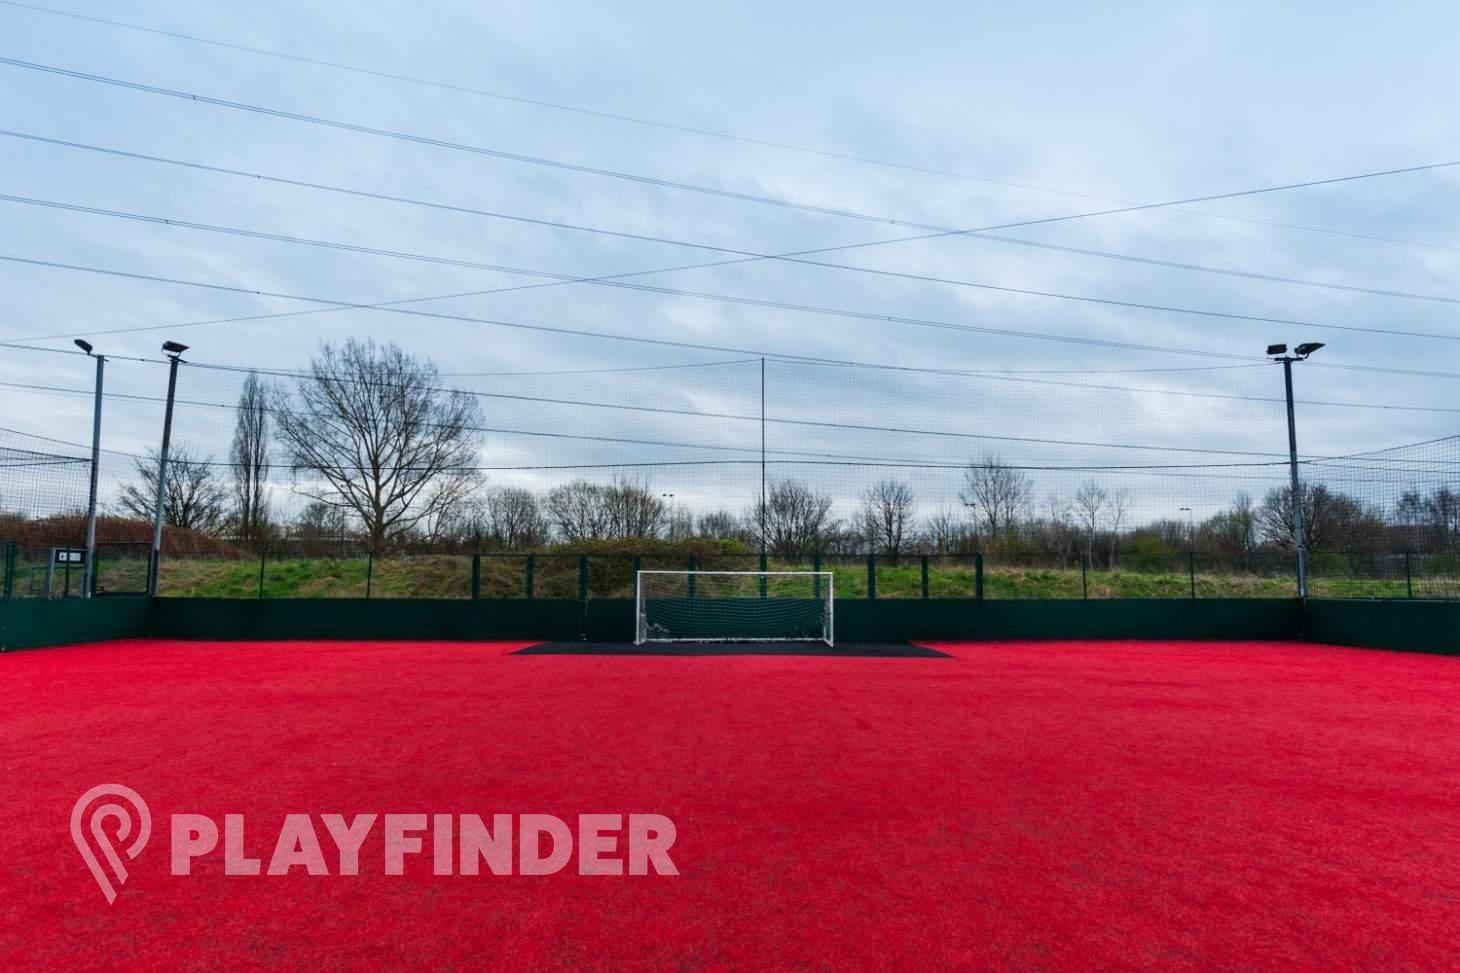 Powerleague Stockport 7 a side | 3G Astroturf football pitch